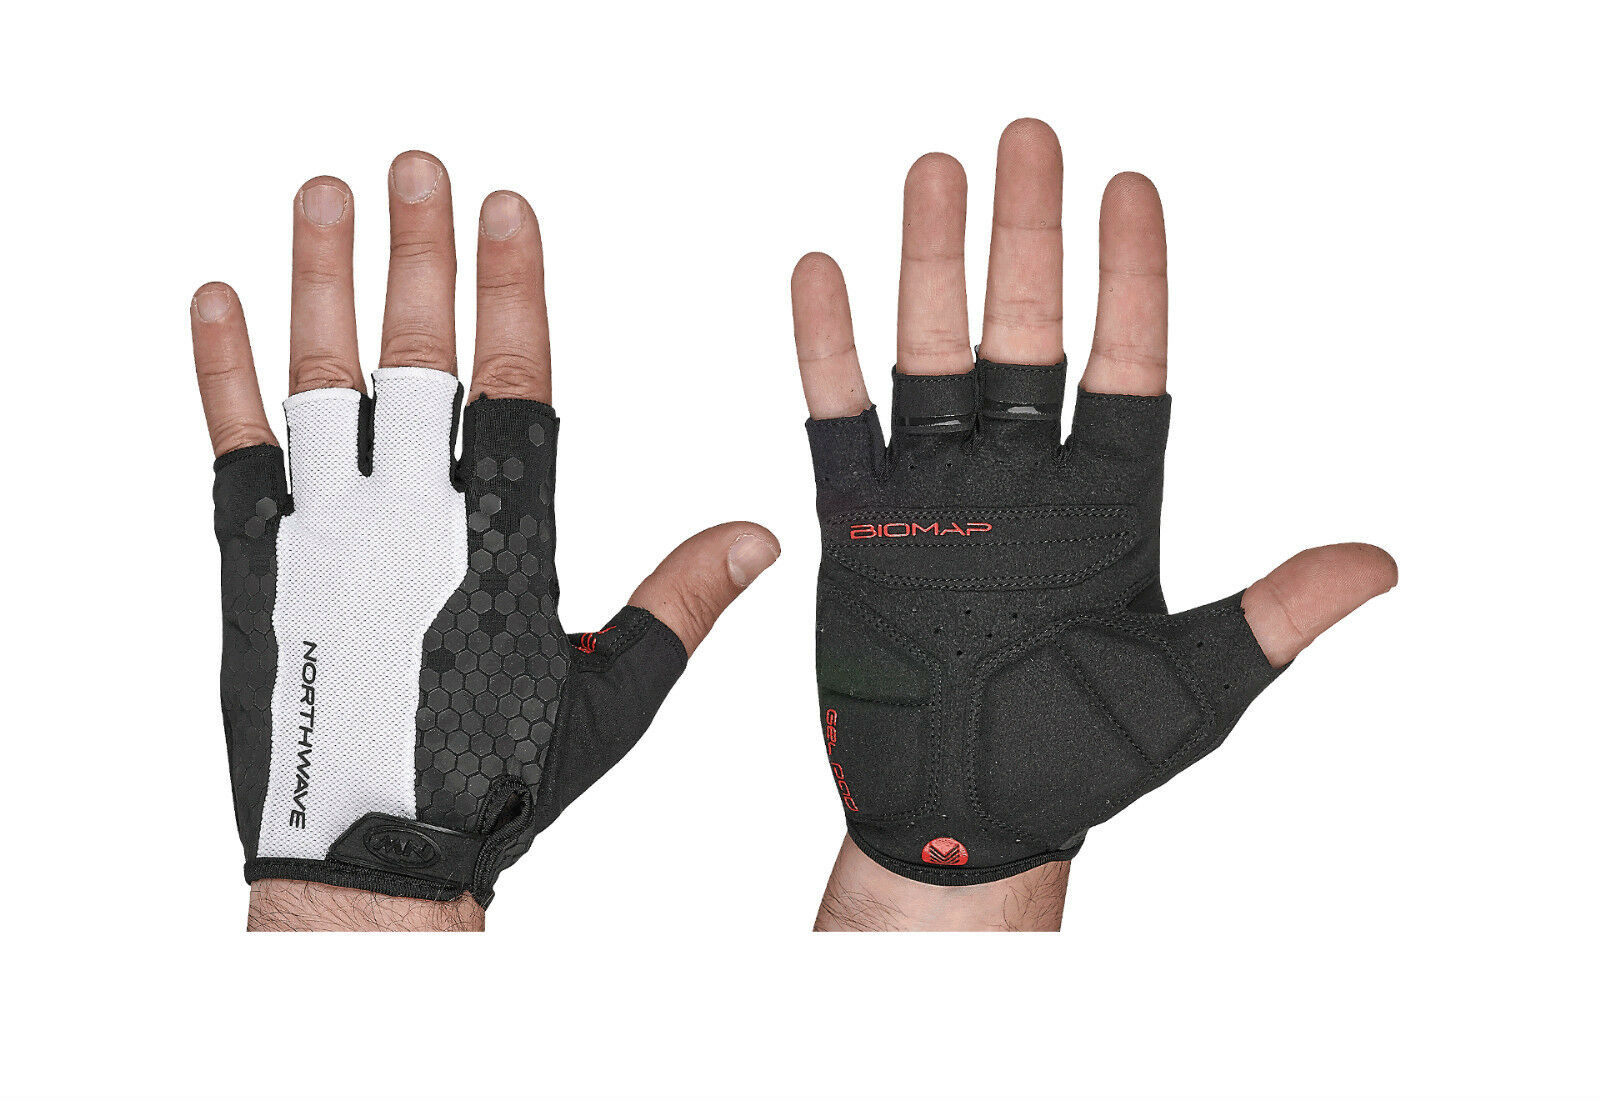 Wimper Handschuhe Sommer Northwave Evolution white black Sommer